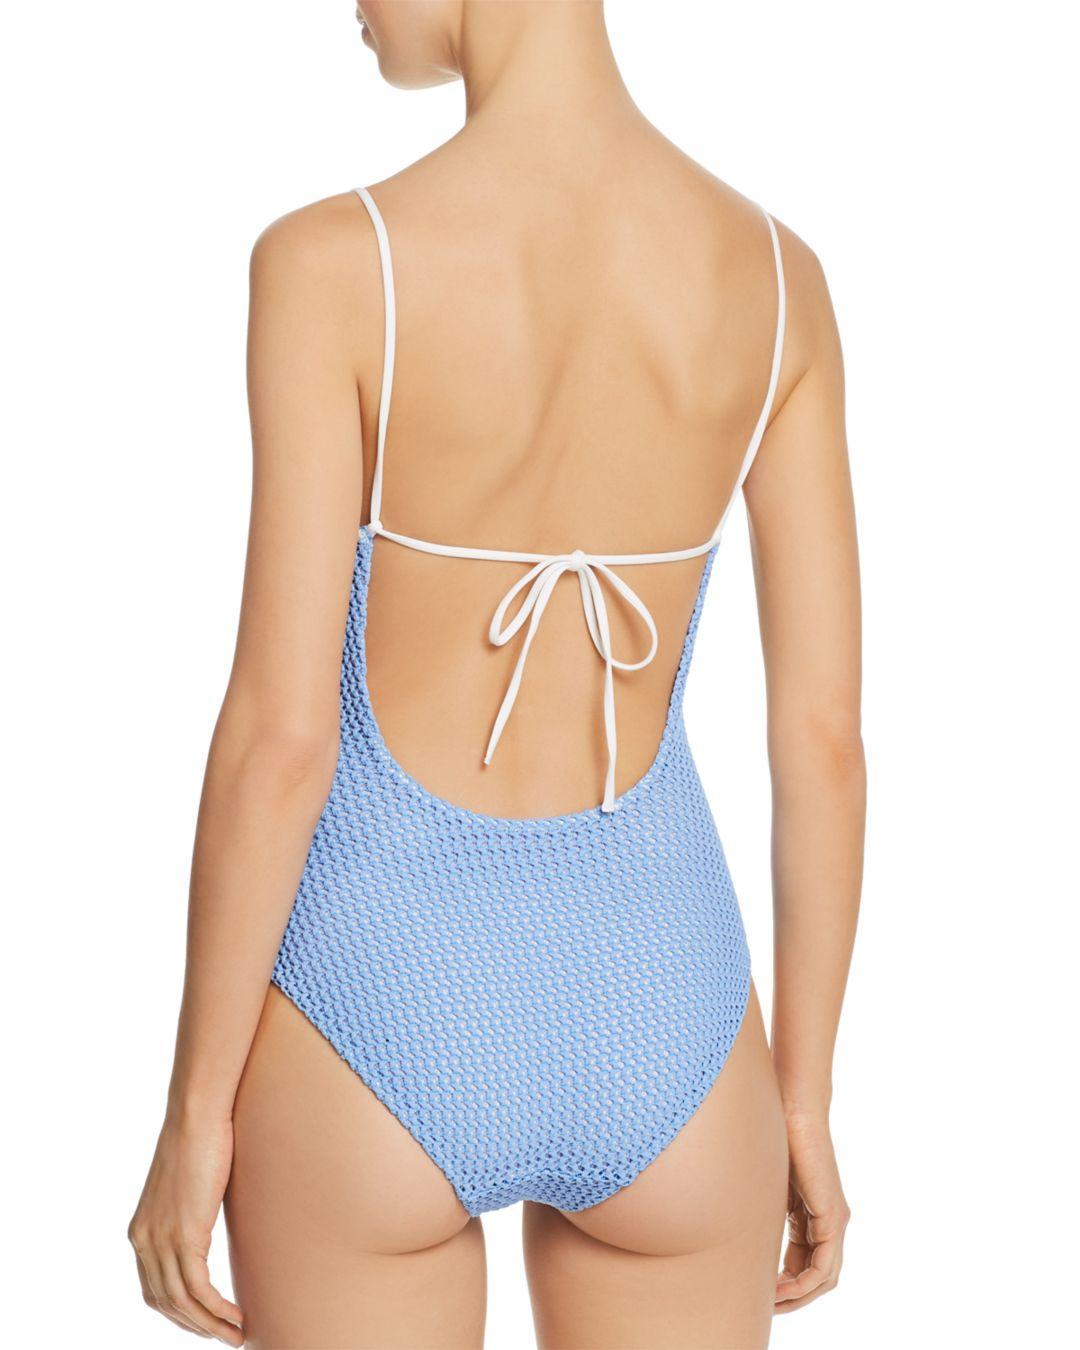 582e111c9203c Lyst - Onia Gloria One Piece Swimsuit in Blue